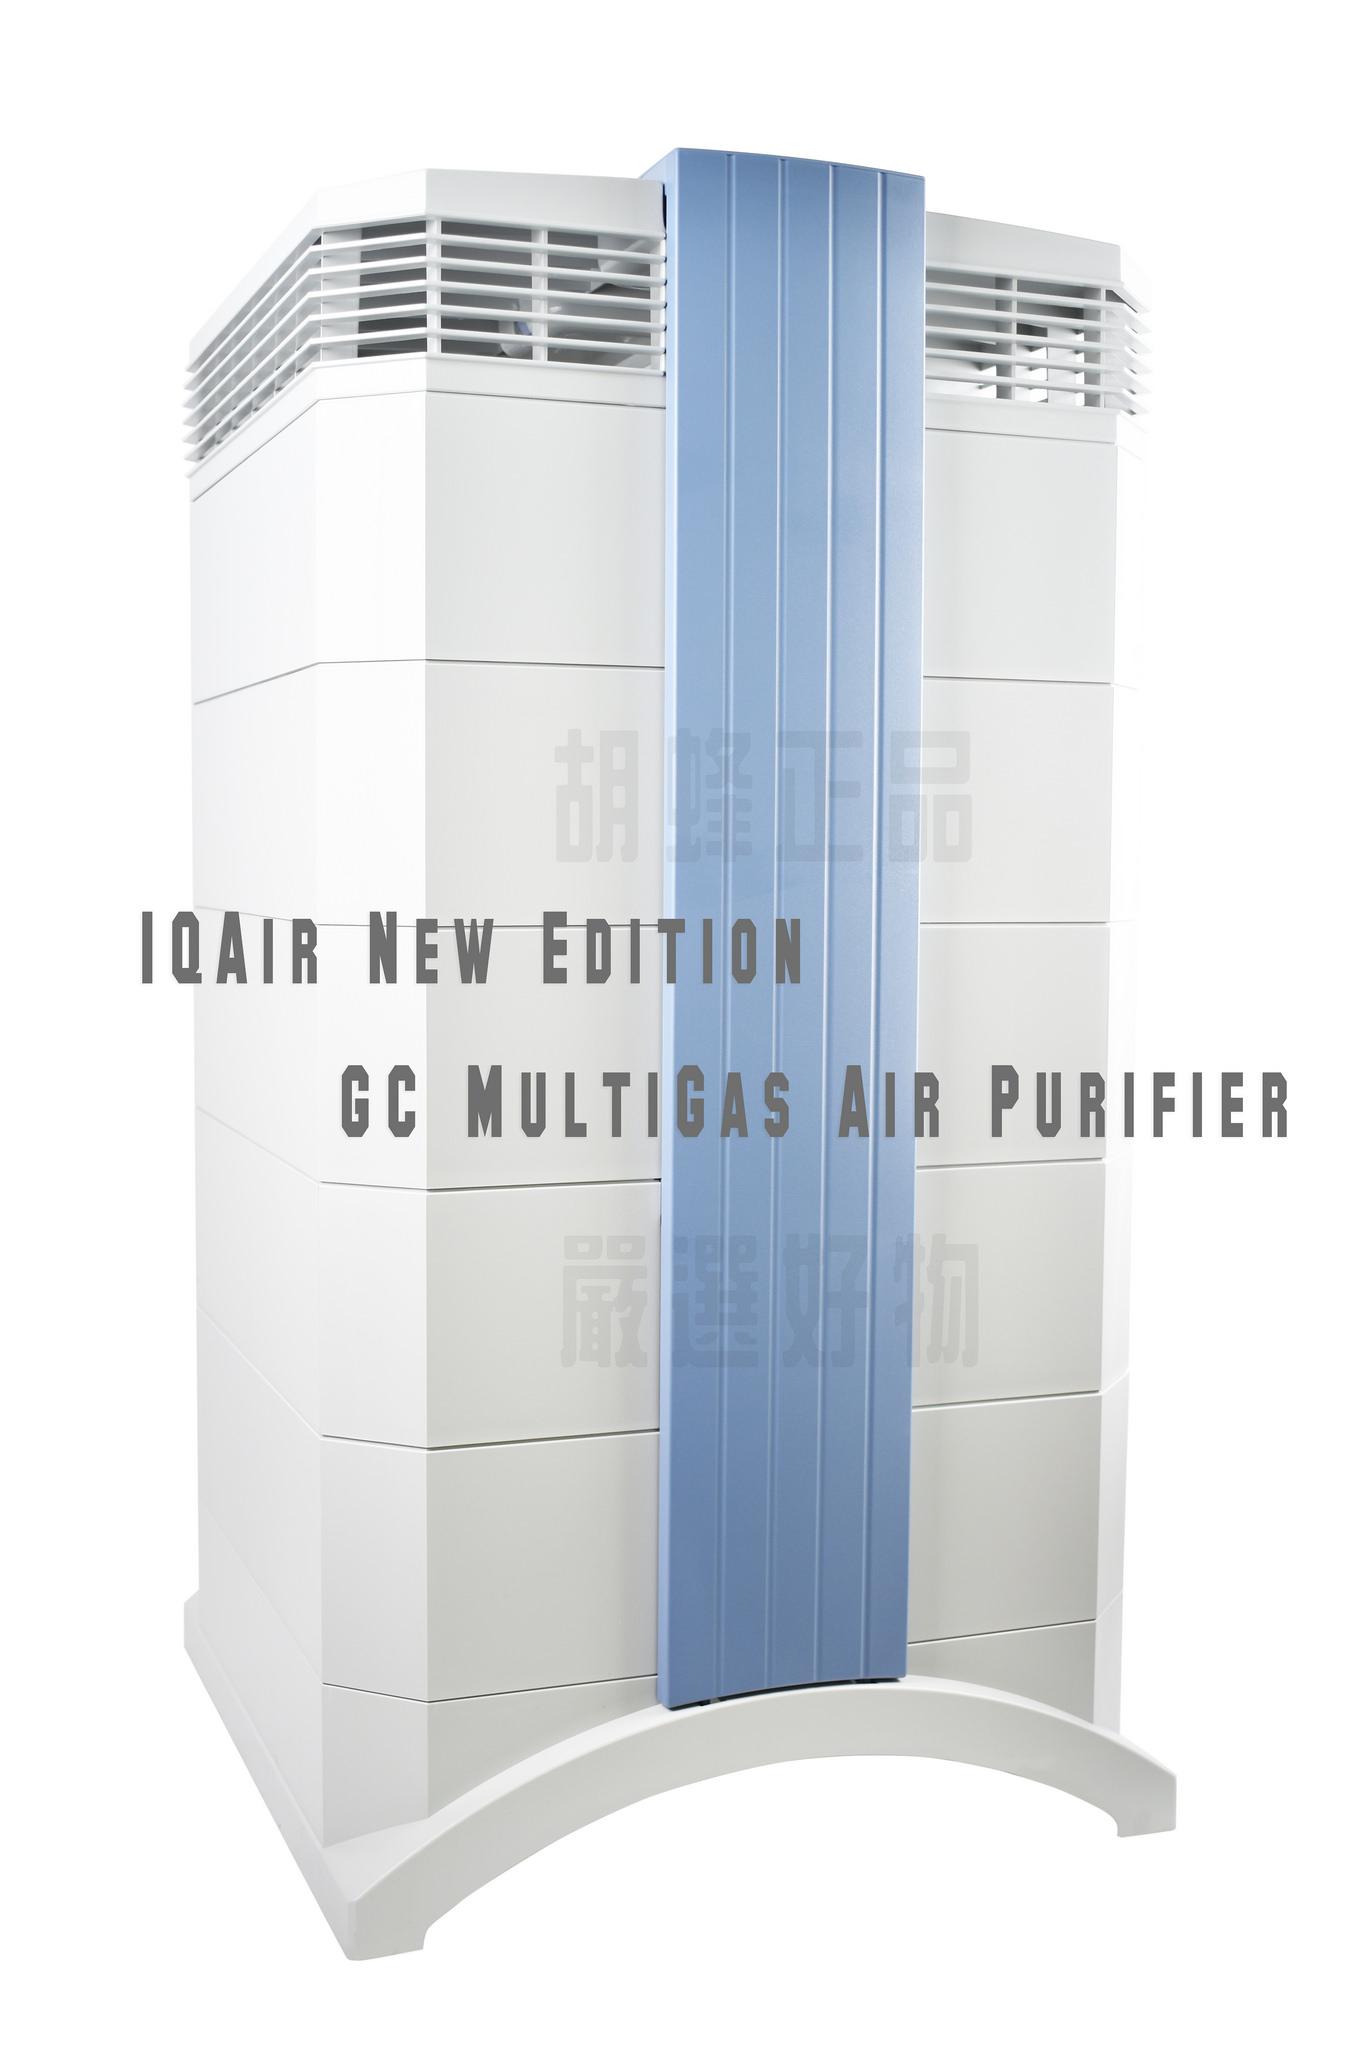 代購 美國 IQAirR New Edition GC MultiGas Air Purifier 空氣清淨機